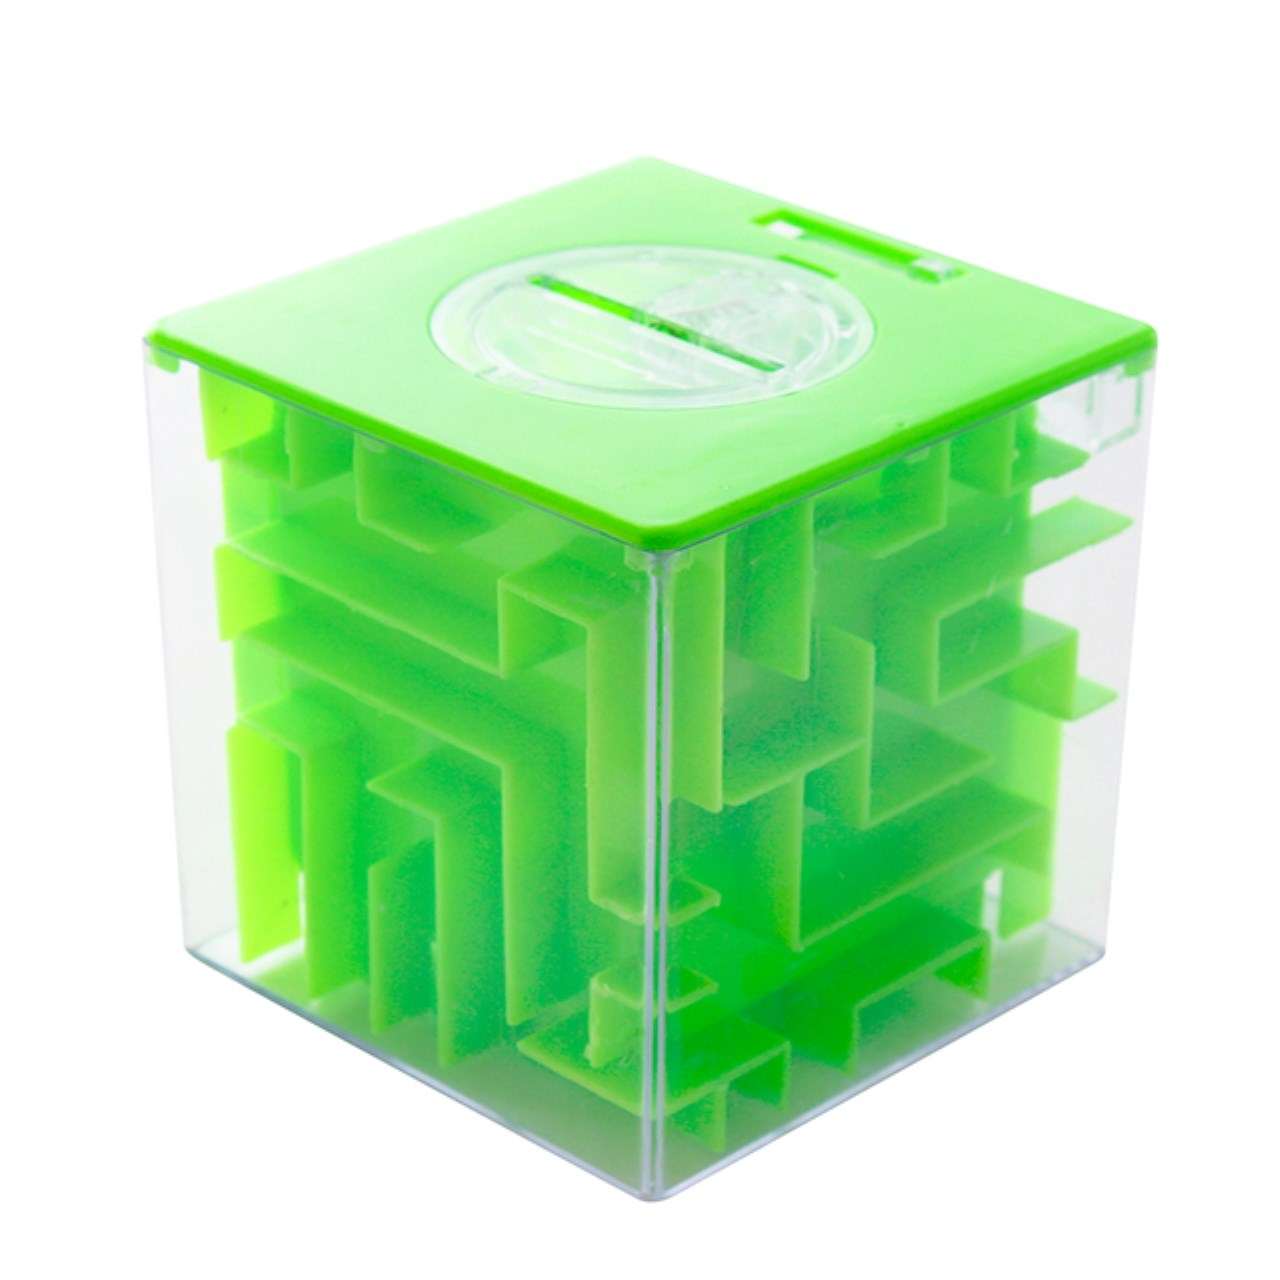 Gong Yizhi toy Intelligence balance ball 61 gift maze deposit cans 3D stereoscopic magic labyrinth fan